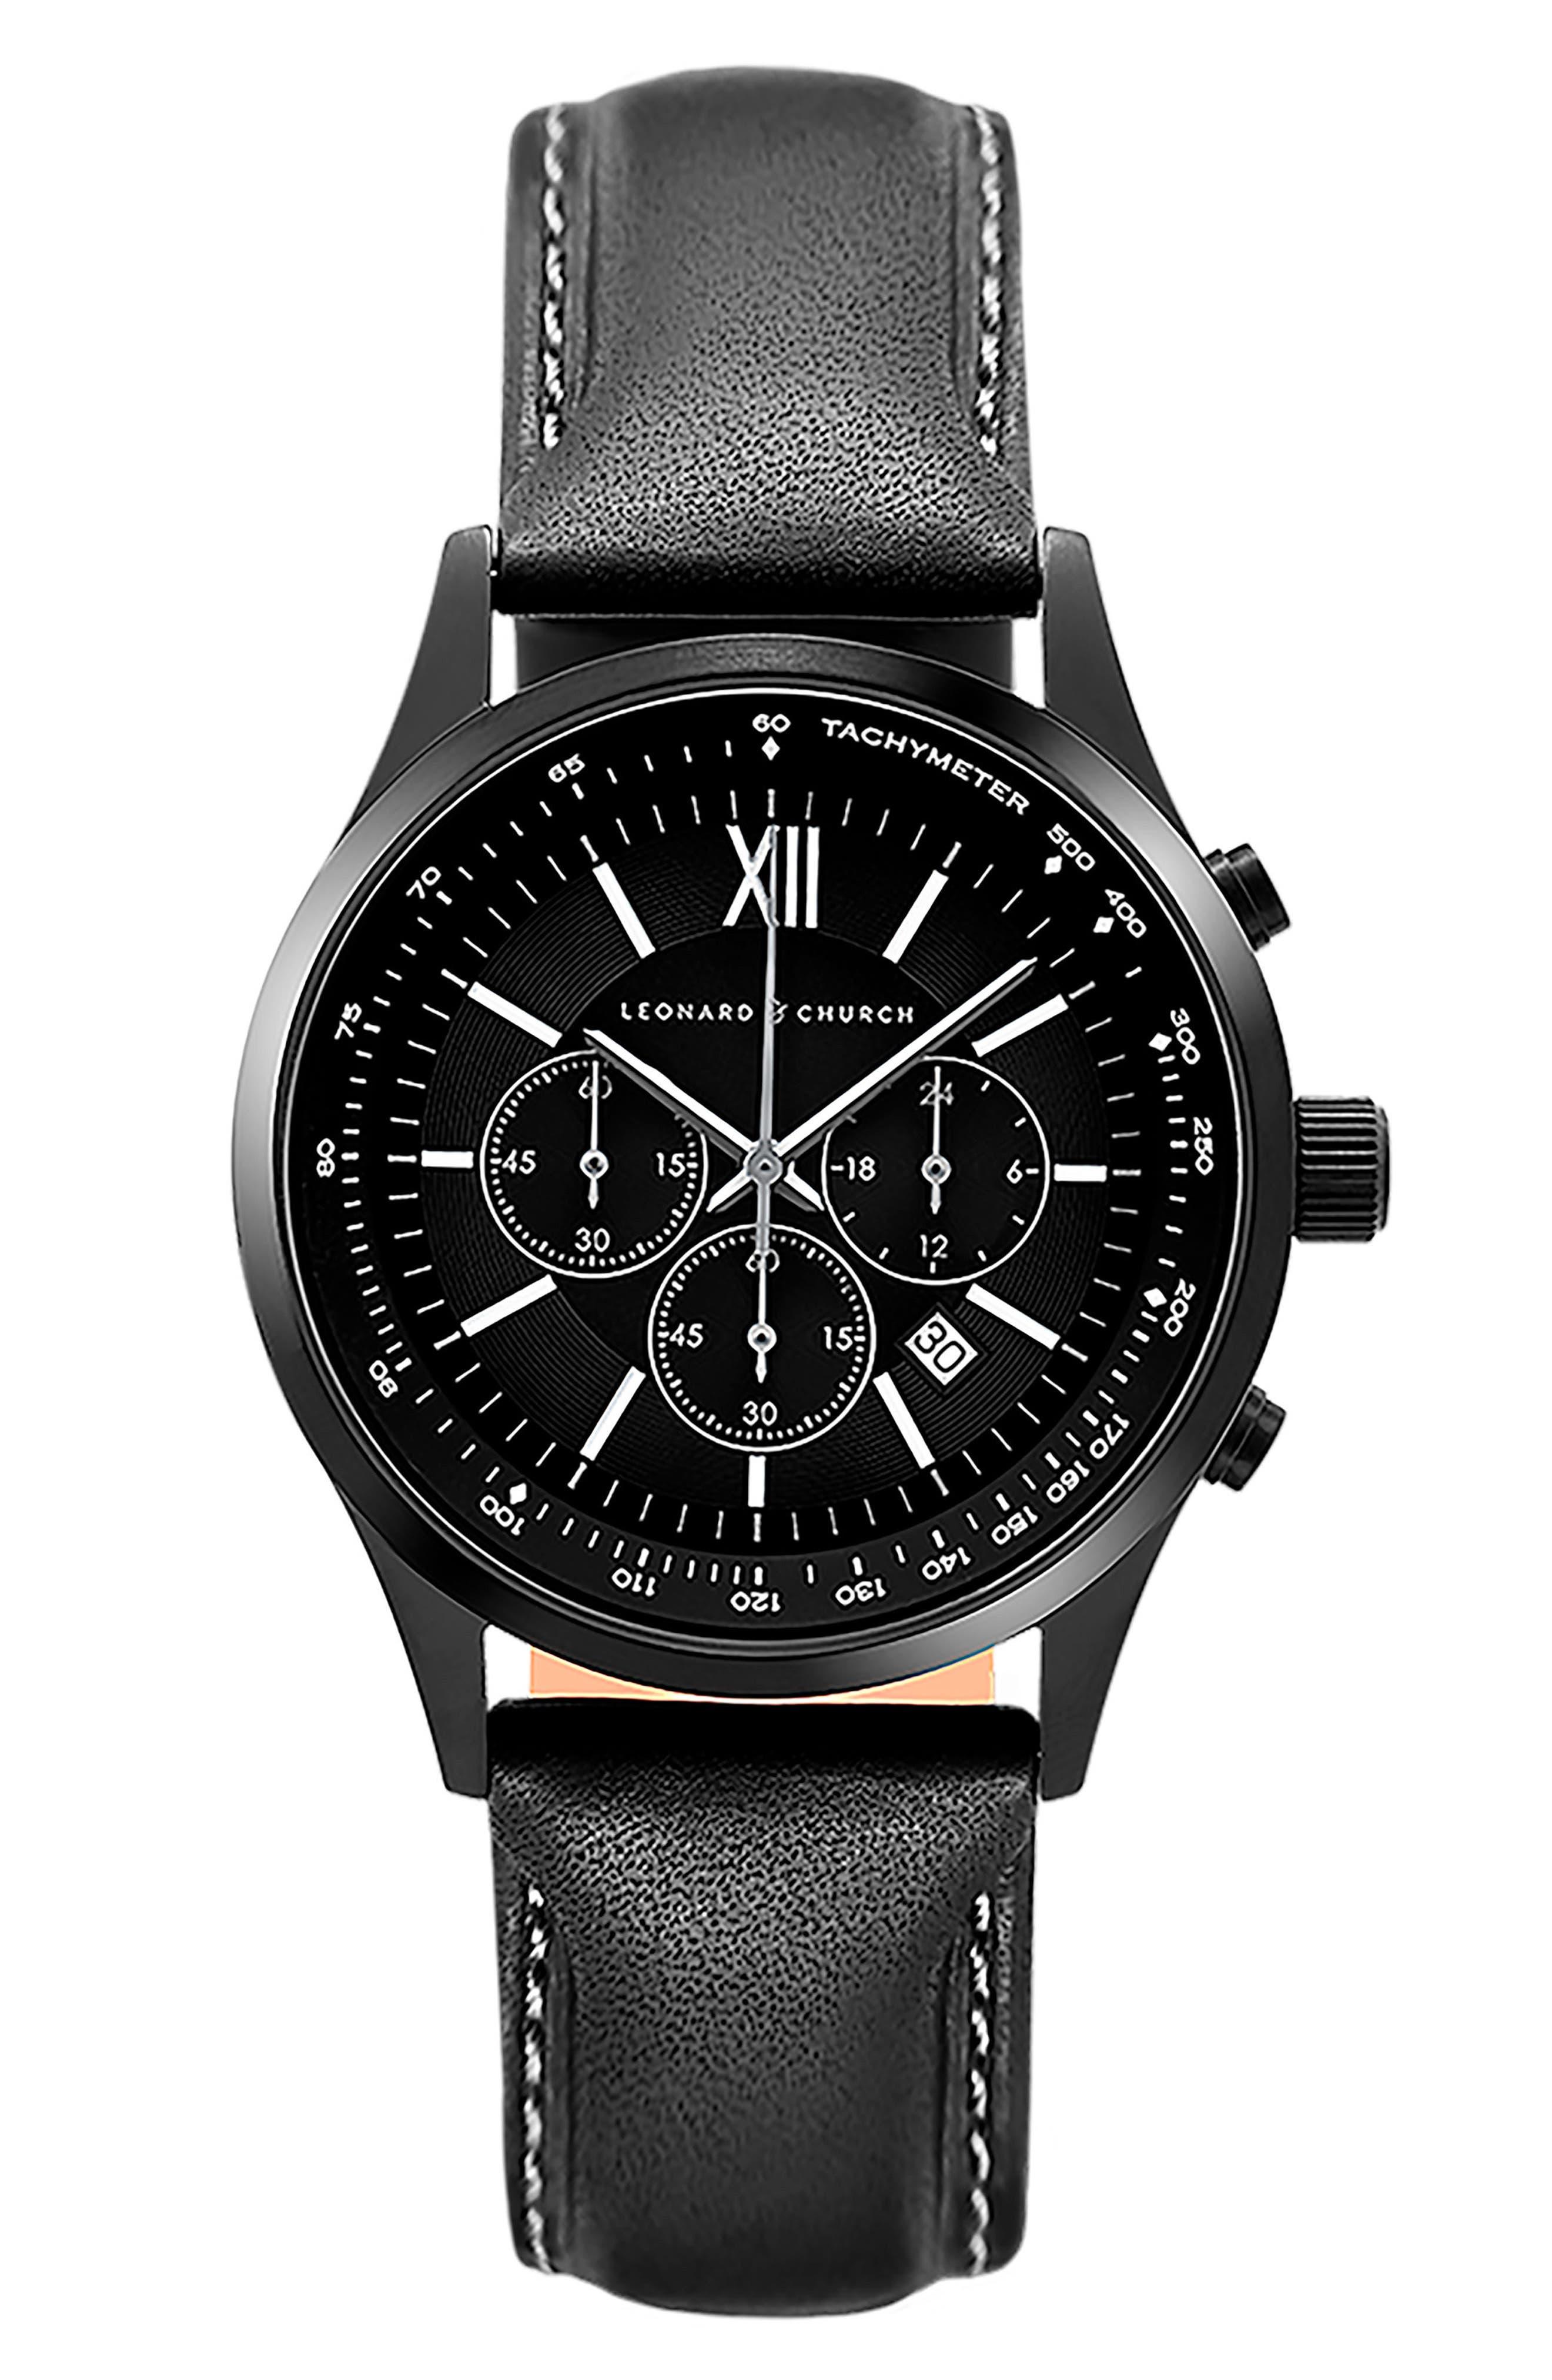 Leonard & Church Bowery Chronograph Leather Strap Watch, 43mm